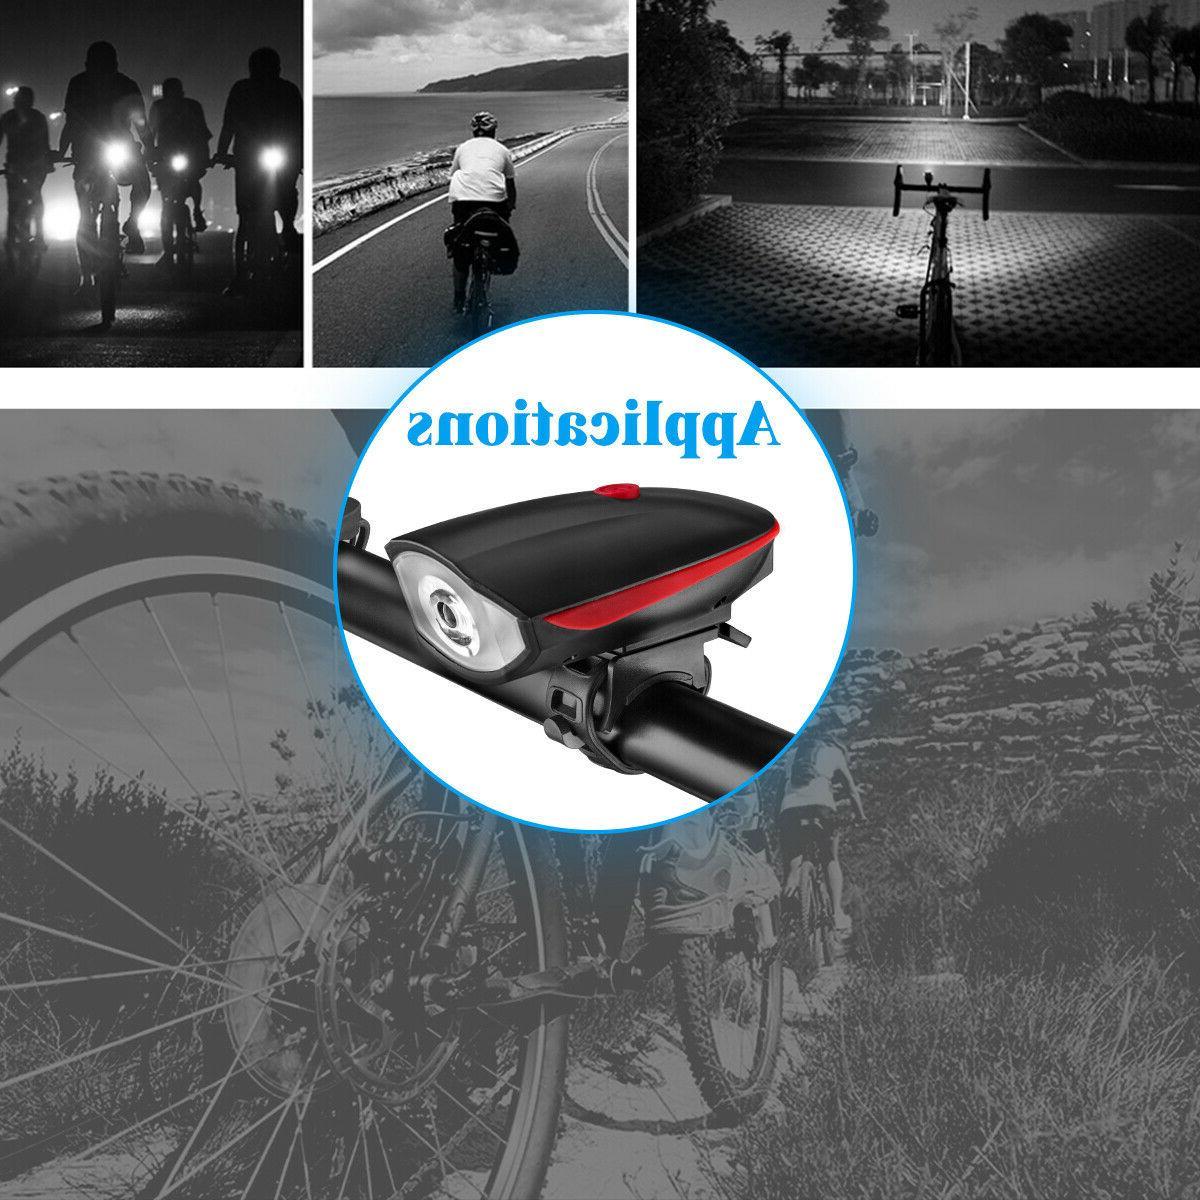 Super Bright Led Bike Headlight &Taillight